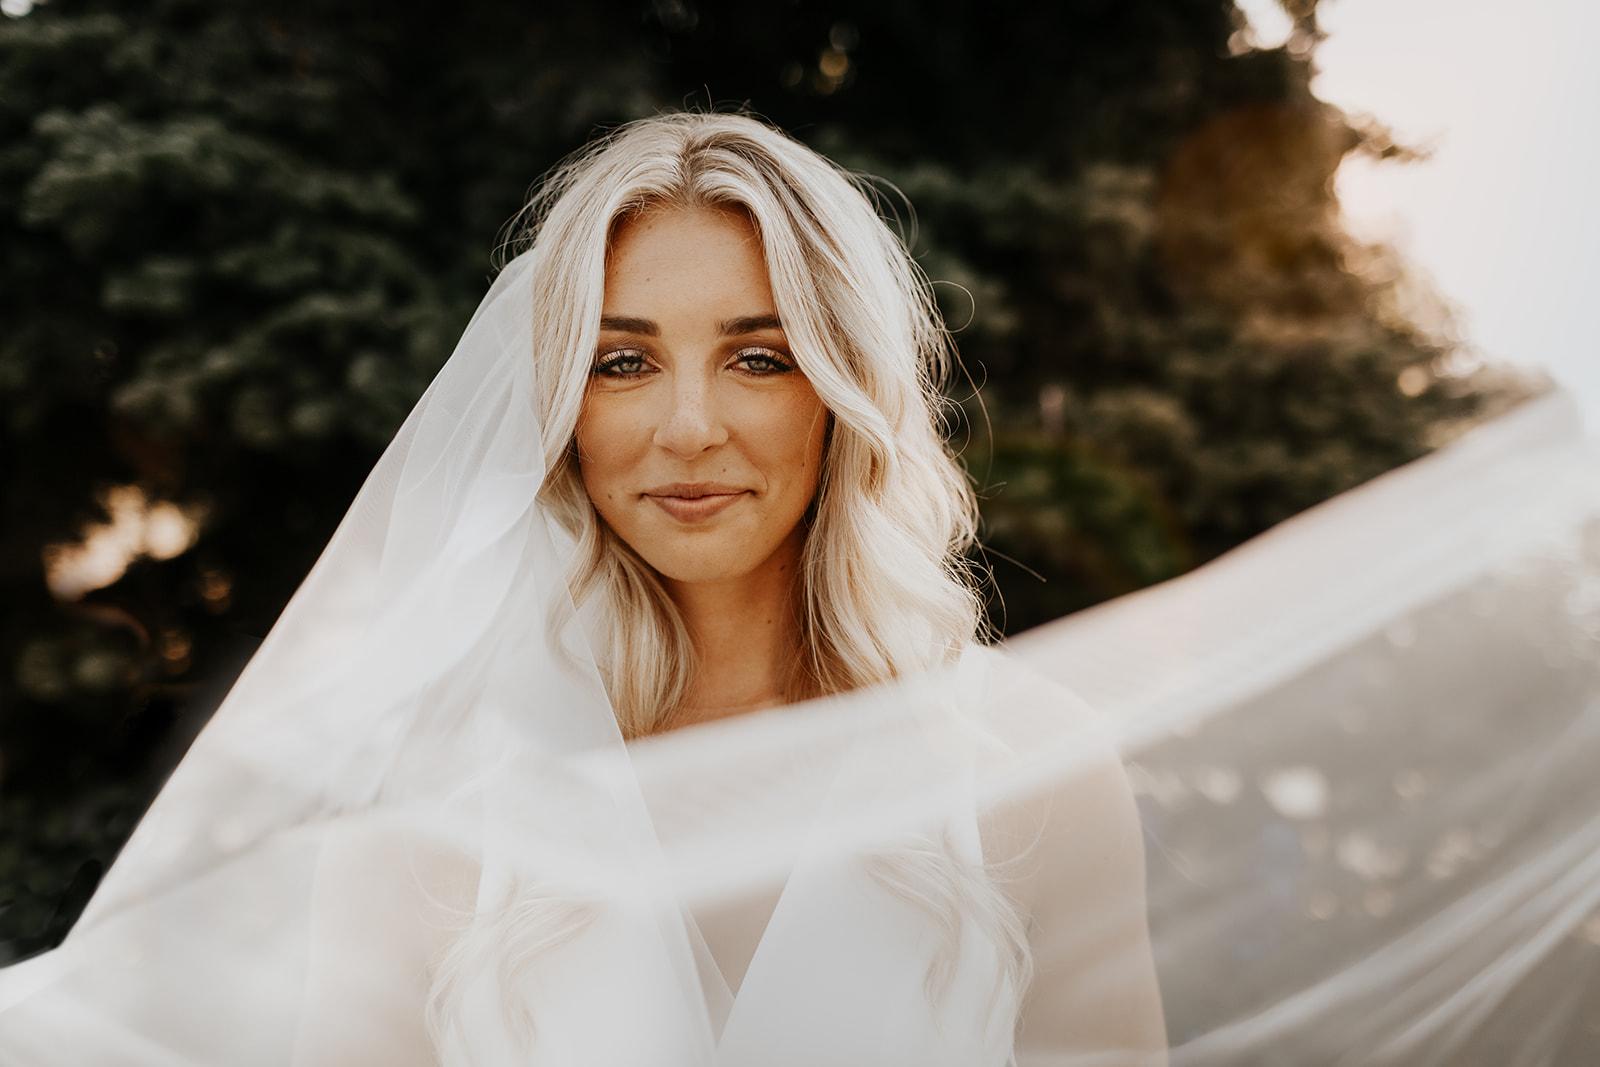 ginapaulson_larabryce_weddingadd-2.jpg